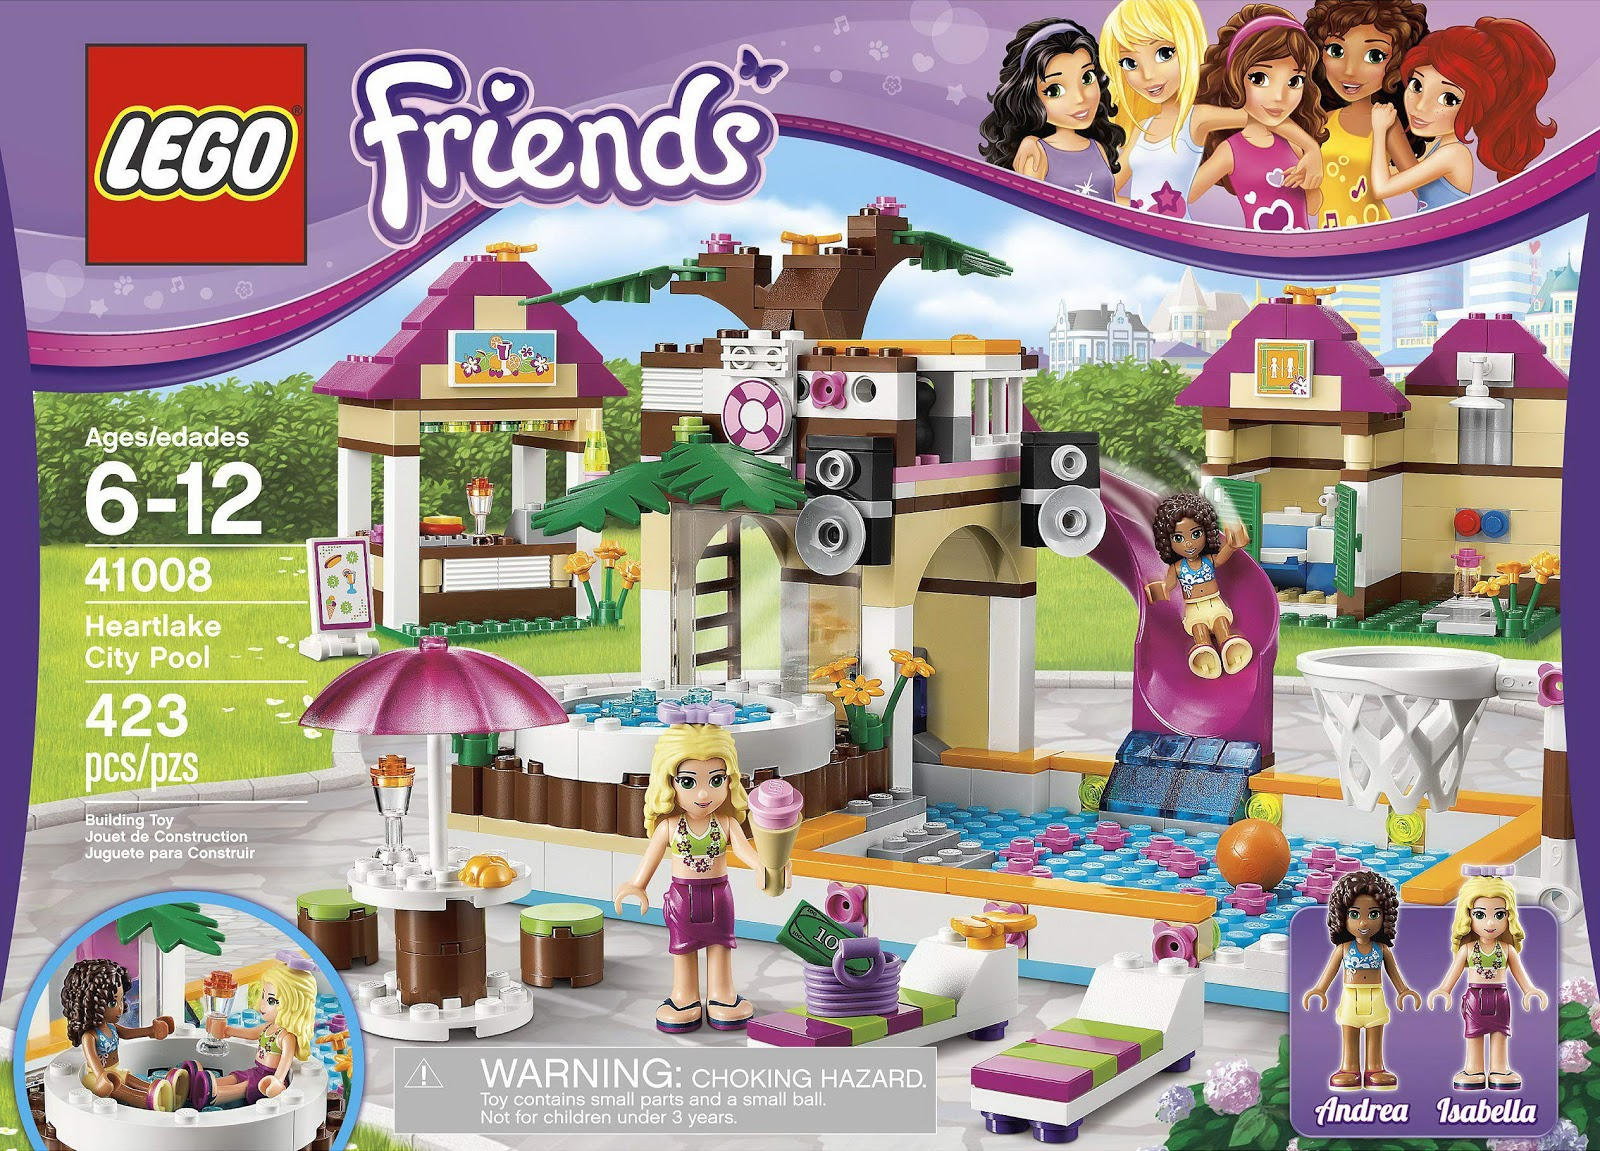 Brick Friends: LEGO 41008 Heartlake City Pool